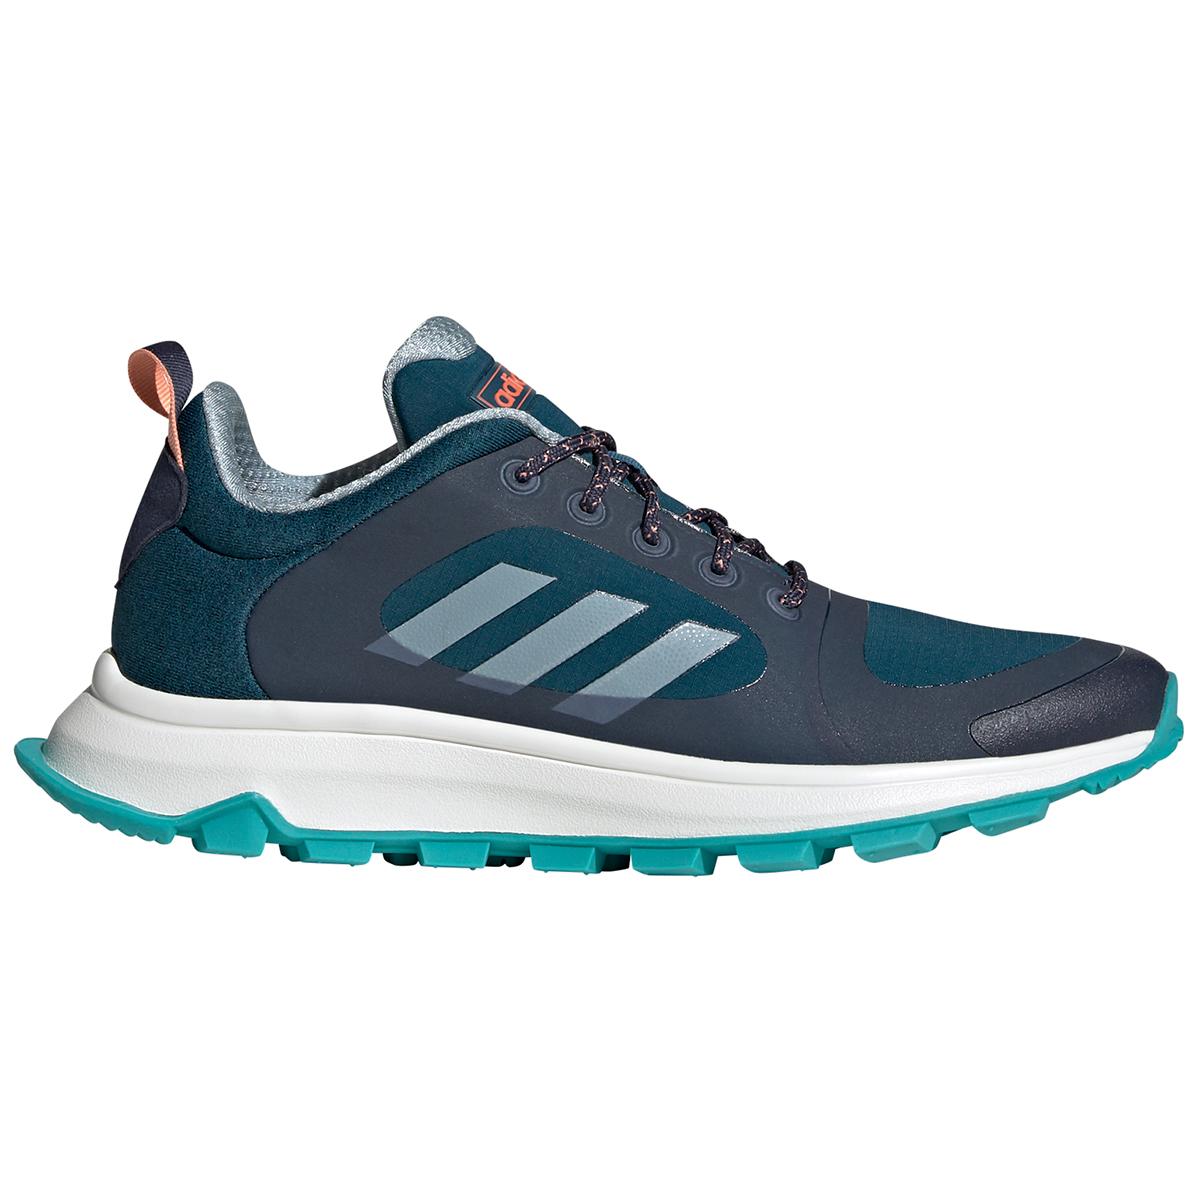 Adidas Women's Response Trail X Running Shoes - Black, 11